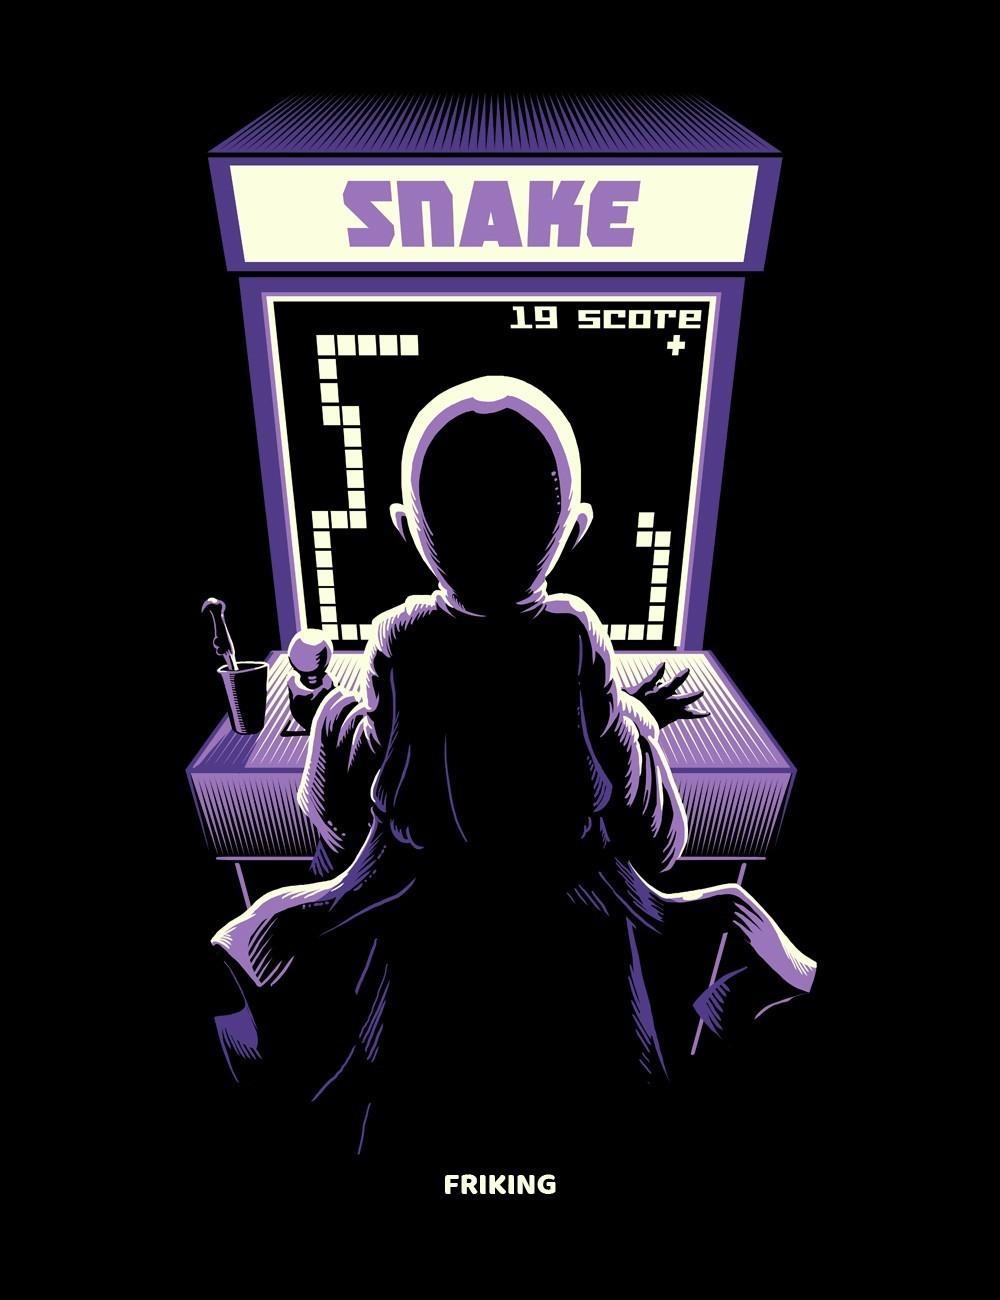 Arcade snake